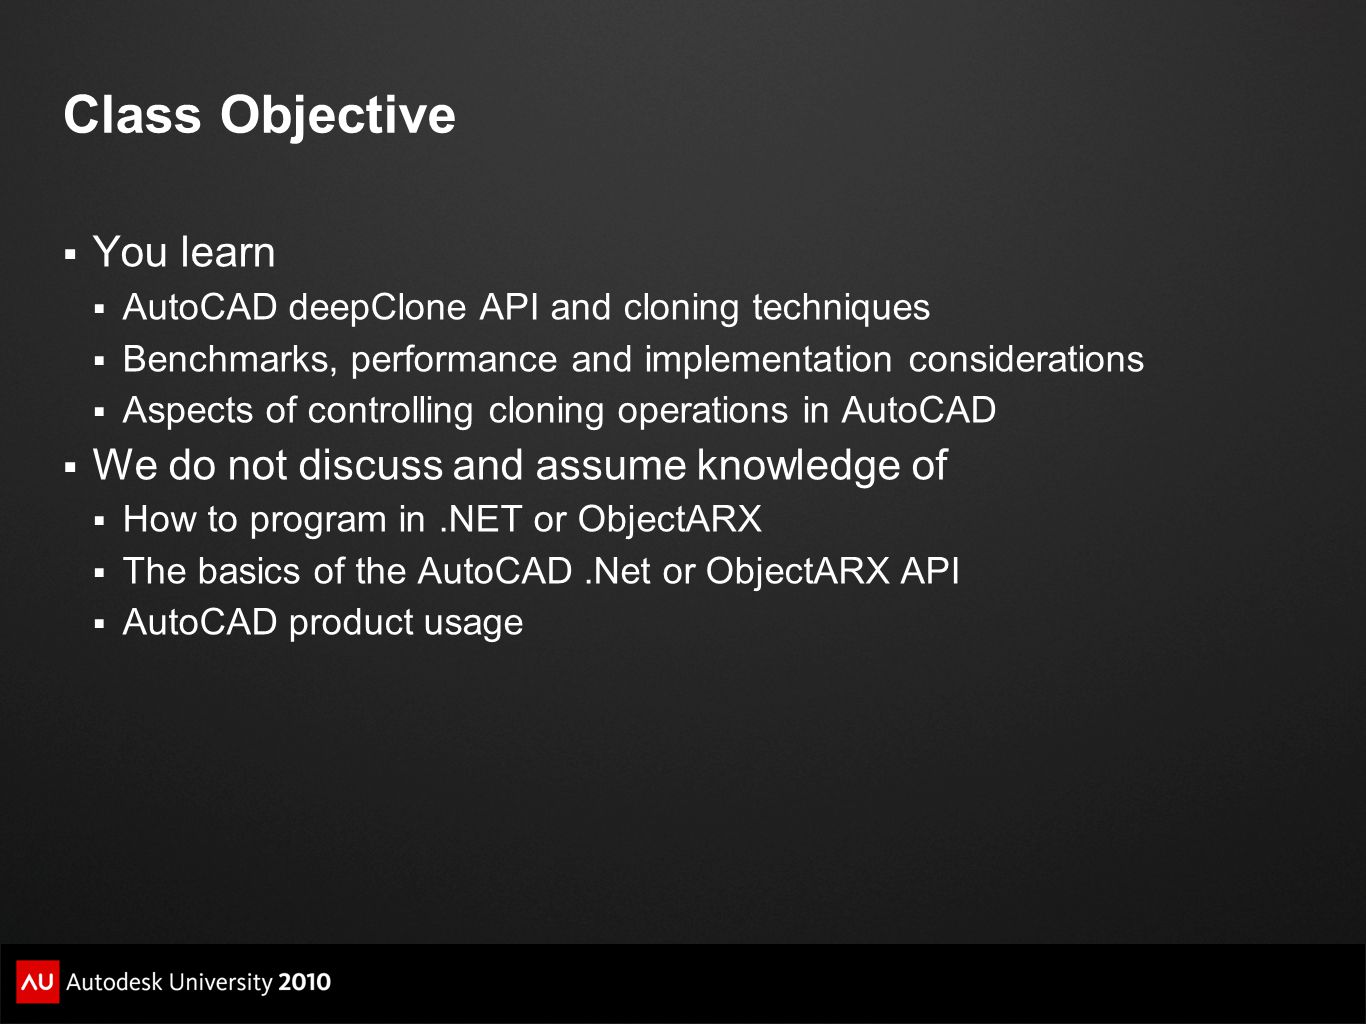 Overrule API  ObjectARX and.Net  AcDbObjectOverrule  Acad::ErrorStatus deepClone(const AcDbObject*, AcDbObject*, AcDbObject*&, AcDbIdMapping&, Adesk::Boolean);  Acad::ErrorStatus wblockClone(const AcDbObject*, AcRxObject*, AcDbObject*&, AcDbIdMapping&, Adesk::Boolean);  Autodesk.AutoCAD.DatabaseServices.ObjectOverrule  DBObject DeepClone(DBObject, DBObject, IdMapping, [MarshalAs(UnmanagedType.U1)] bool);  DBObject WblockClone(DBObject, RXObject, IdMapping, [MarshalAs(UnmanagedType.U1)] bool);